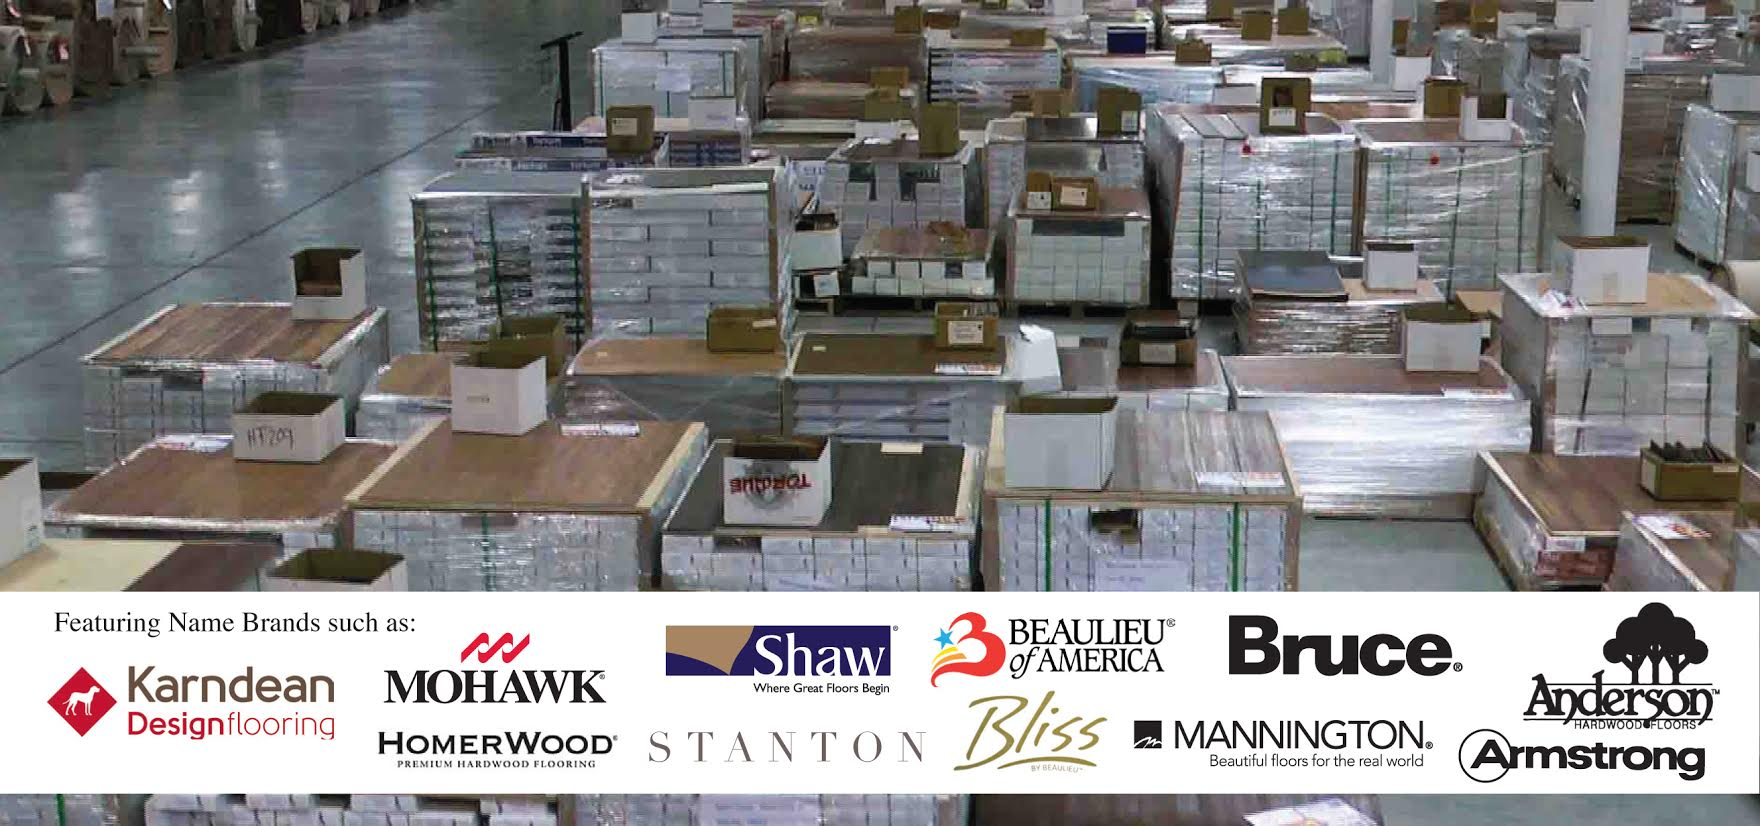 All Major Mills Available! Karndean-Mohawk-Shaw-Bruce-Beaulieu-Mannington